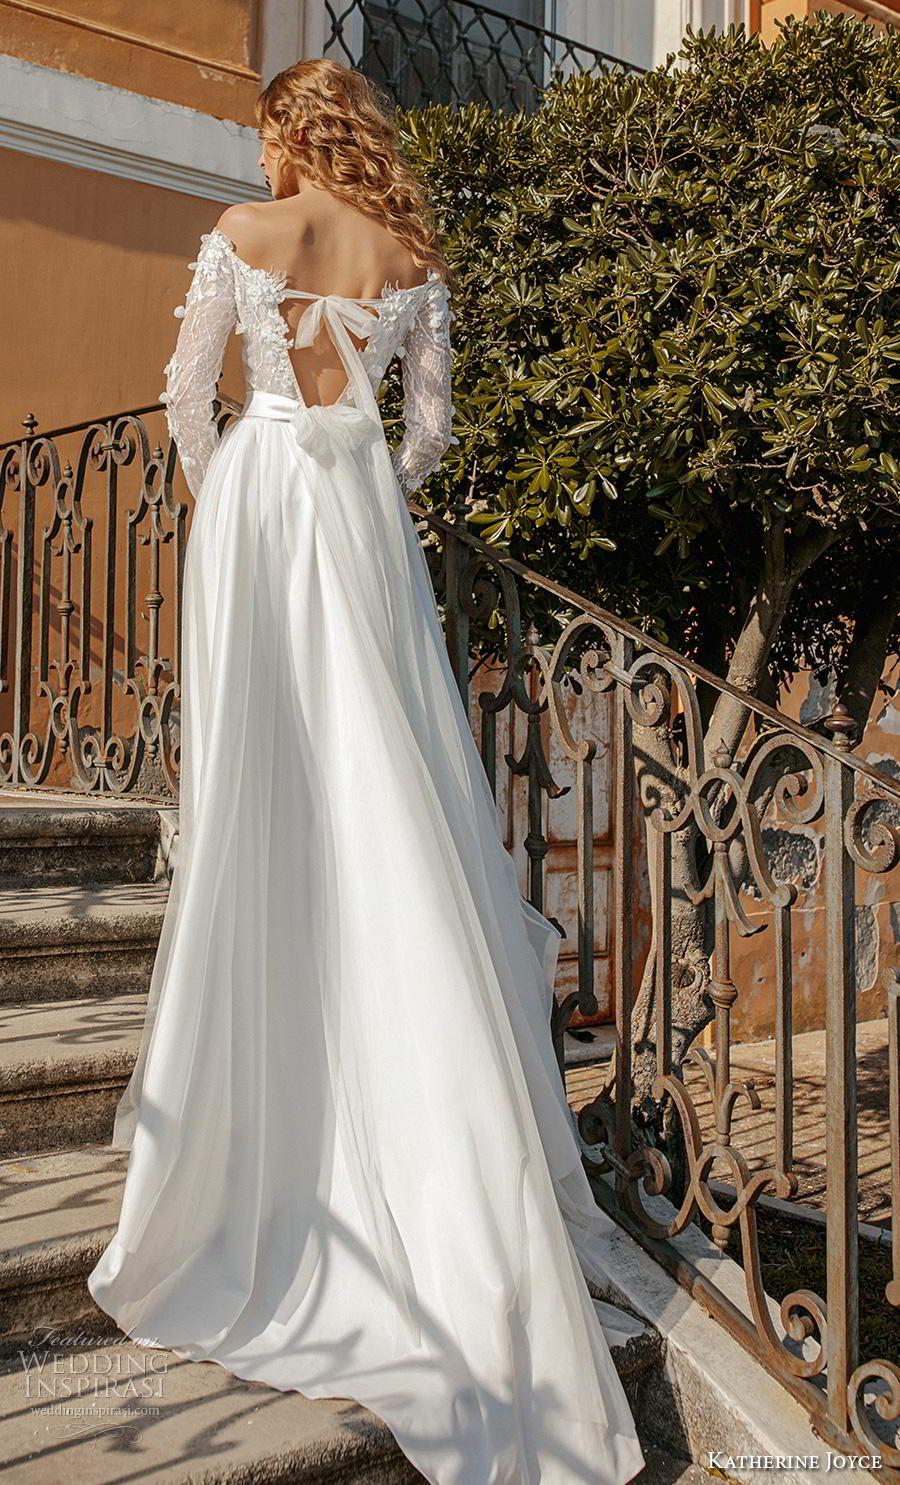 katherine joyce 2019 bridal long sleeves sweetheart neckline hevily embellished bodice satin skirt romantic modified a  line wedding dress v back chapel train (11) bv